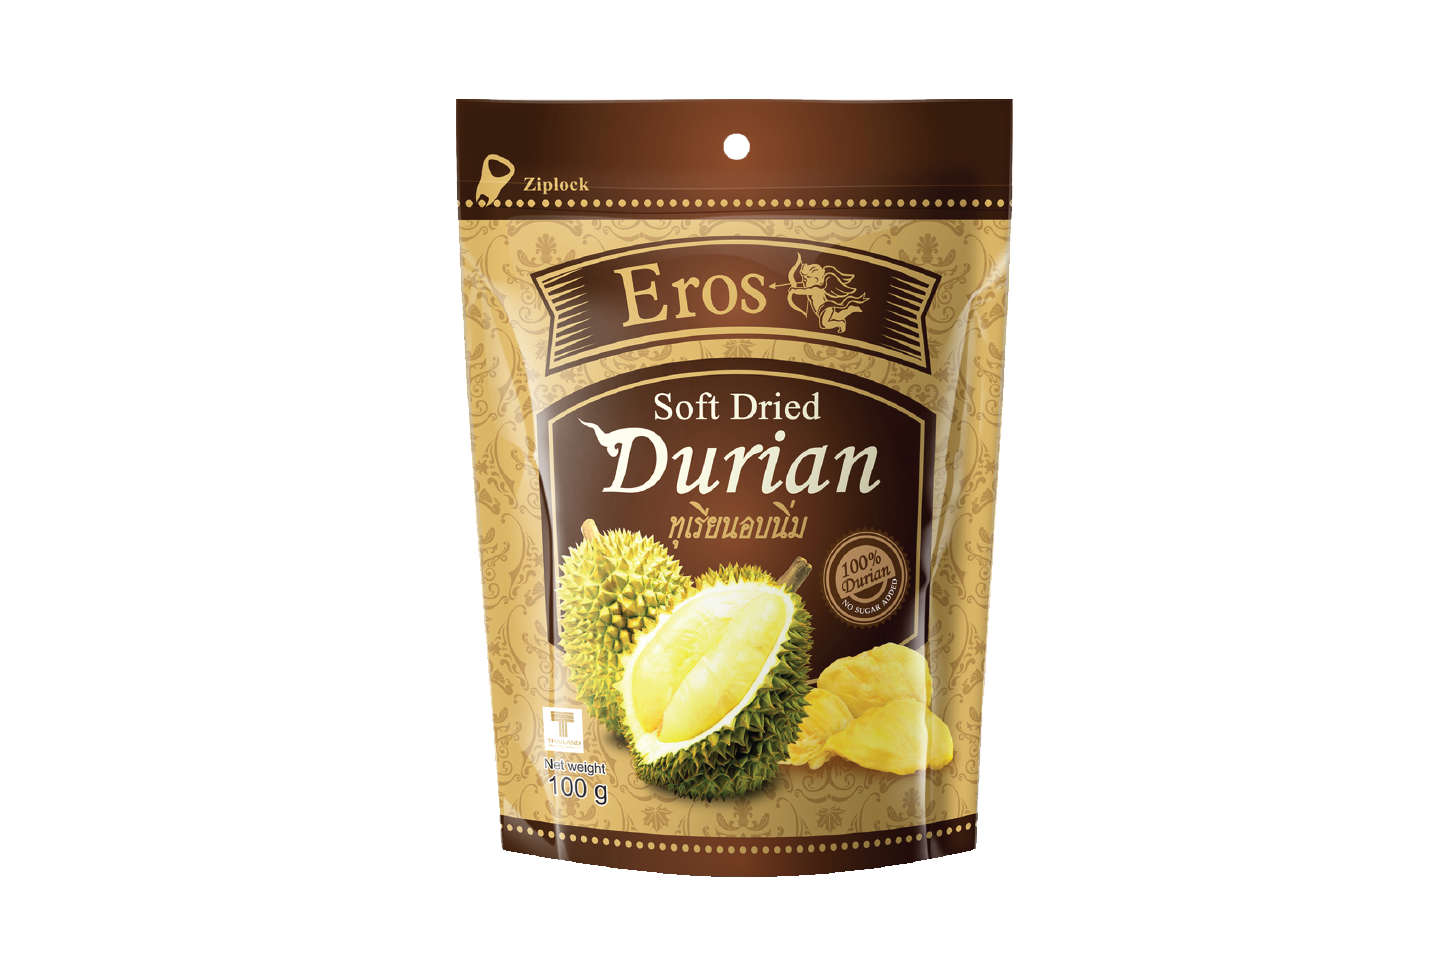 EROS Soft Dried Durian